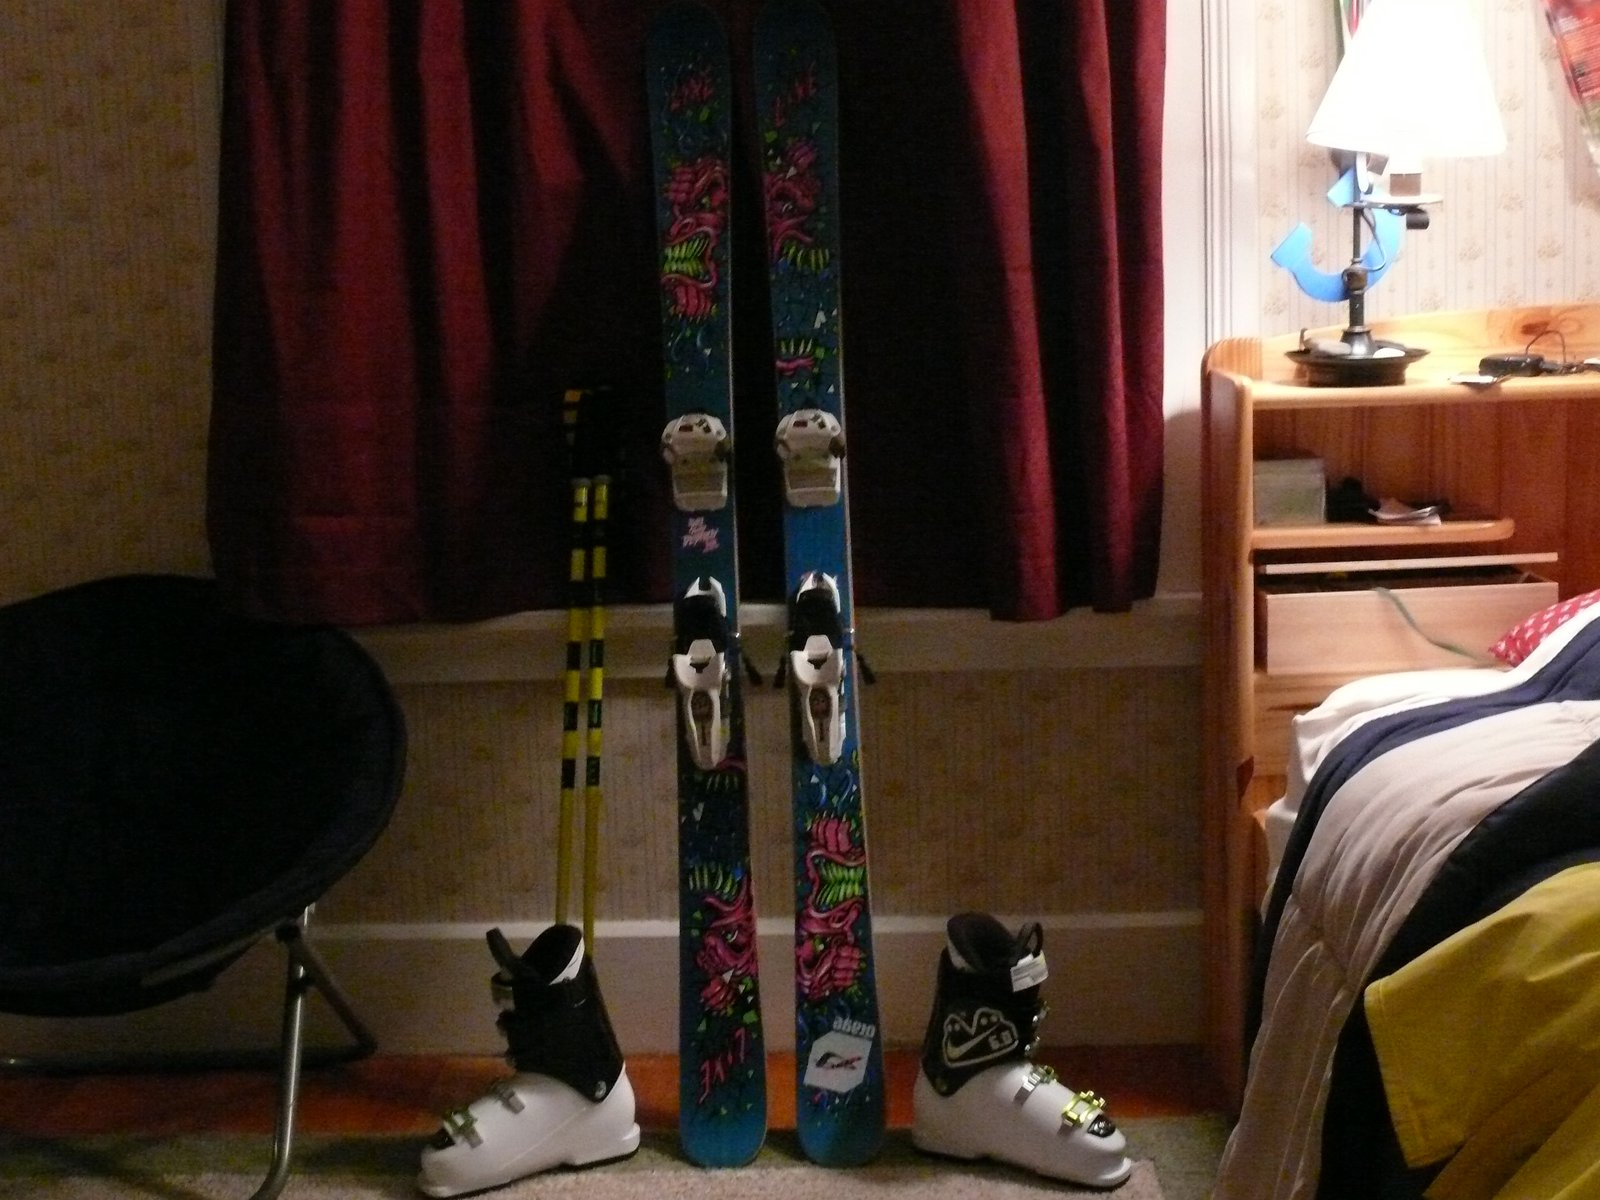 09-10 ski stuff